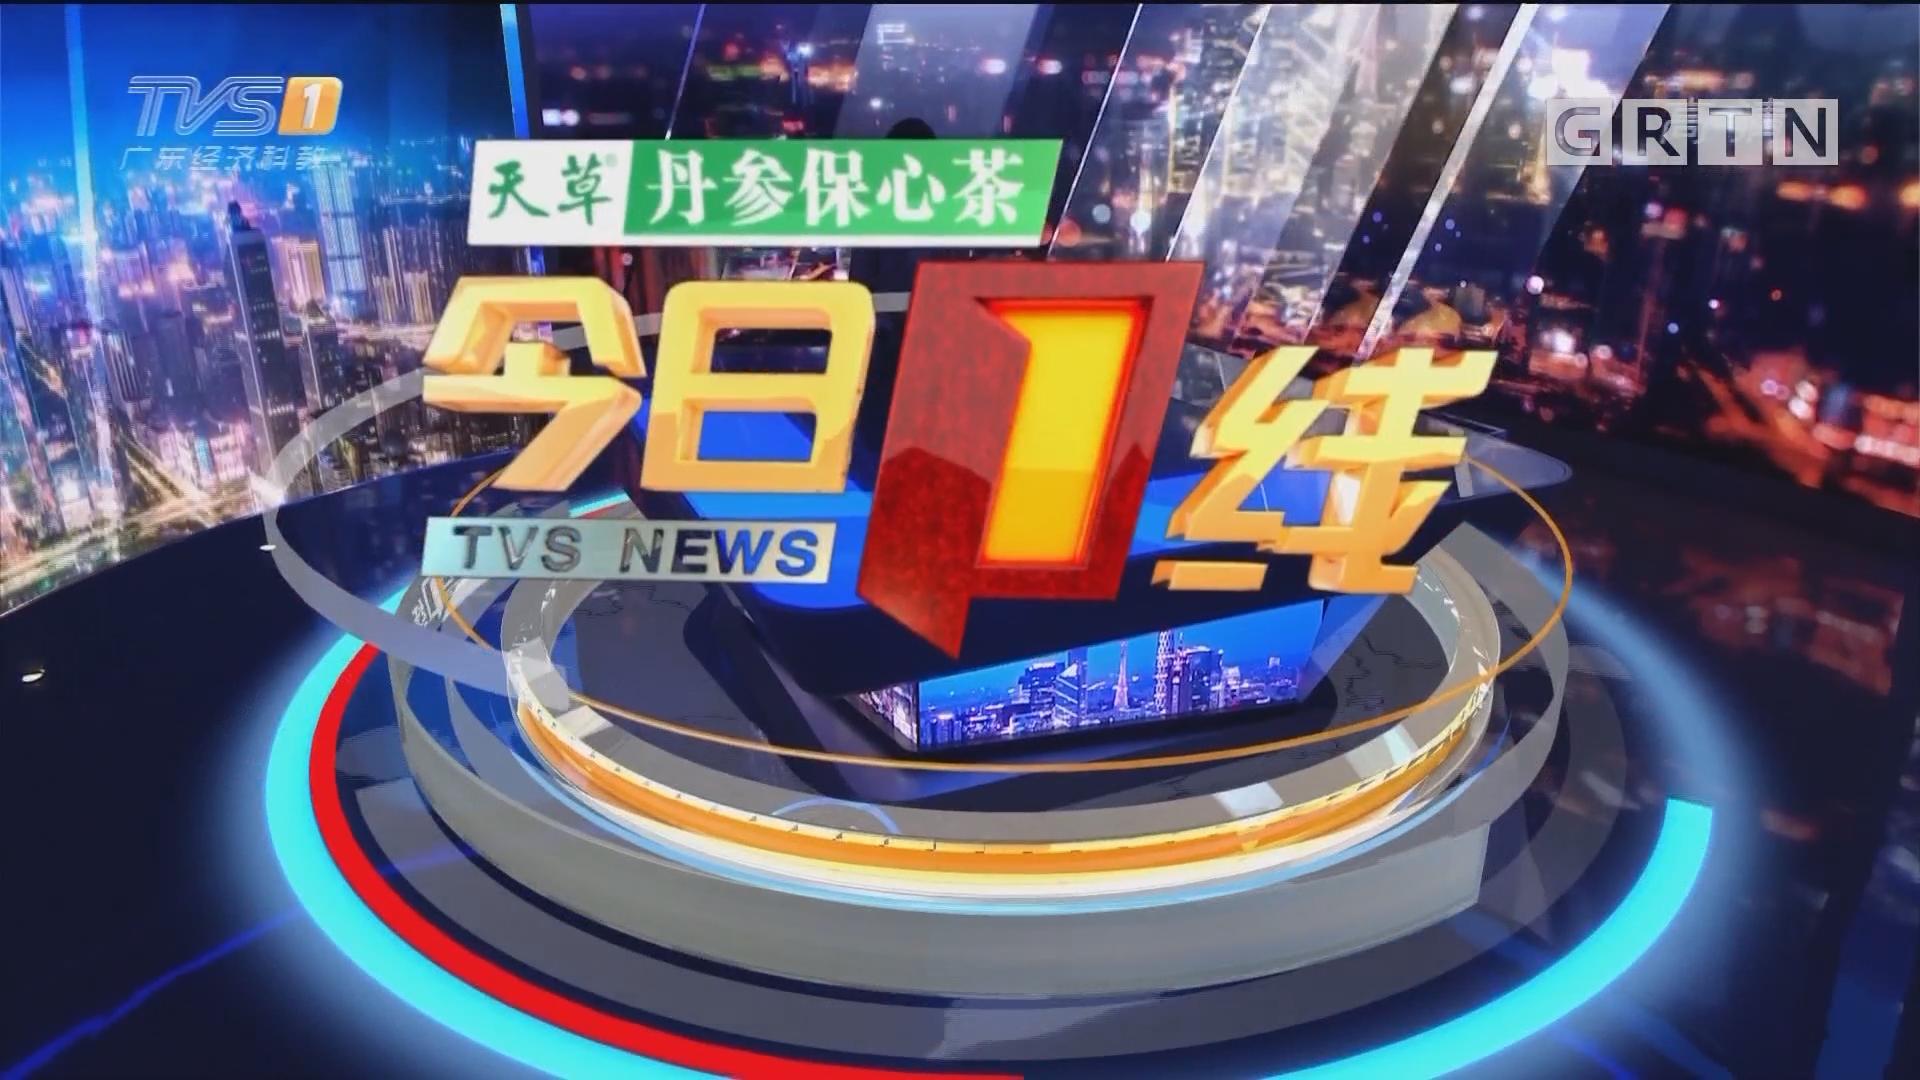 [HD][2019-04-20]今日一线:深圳南山区:暴雨中挡土墙垮塌 消防火速救援